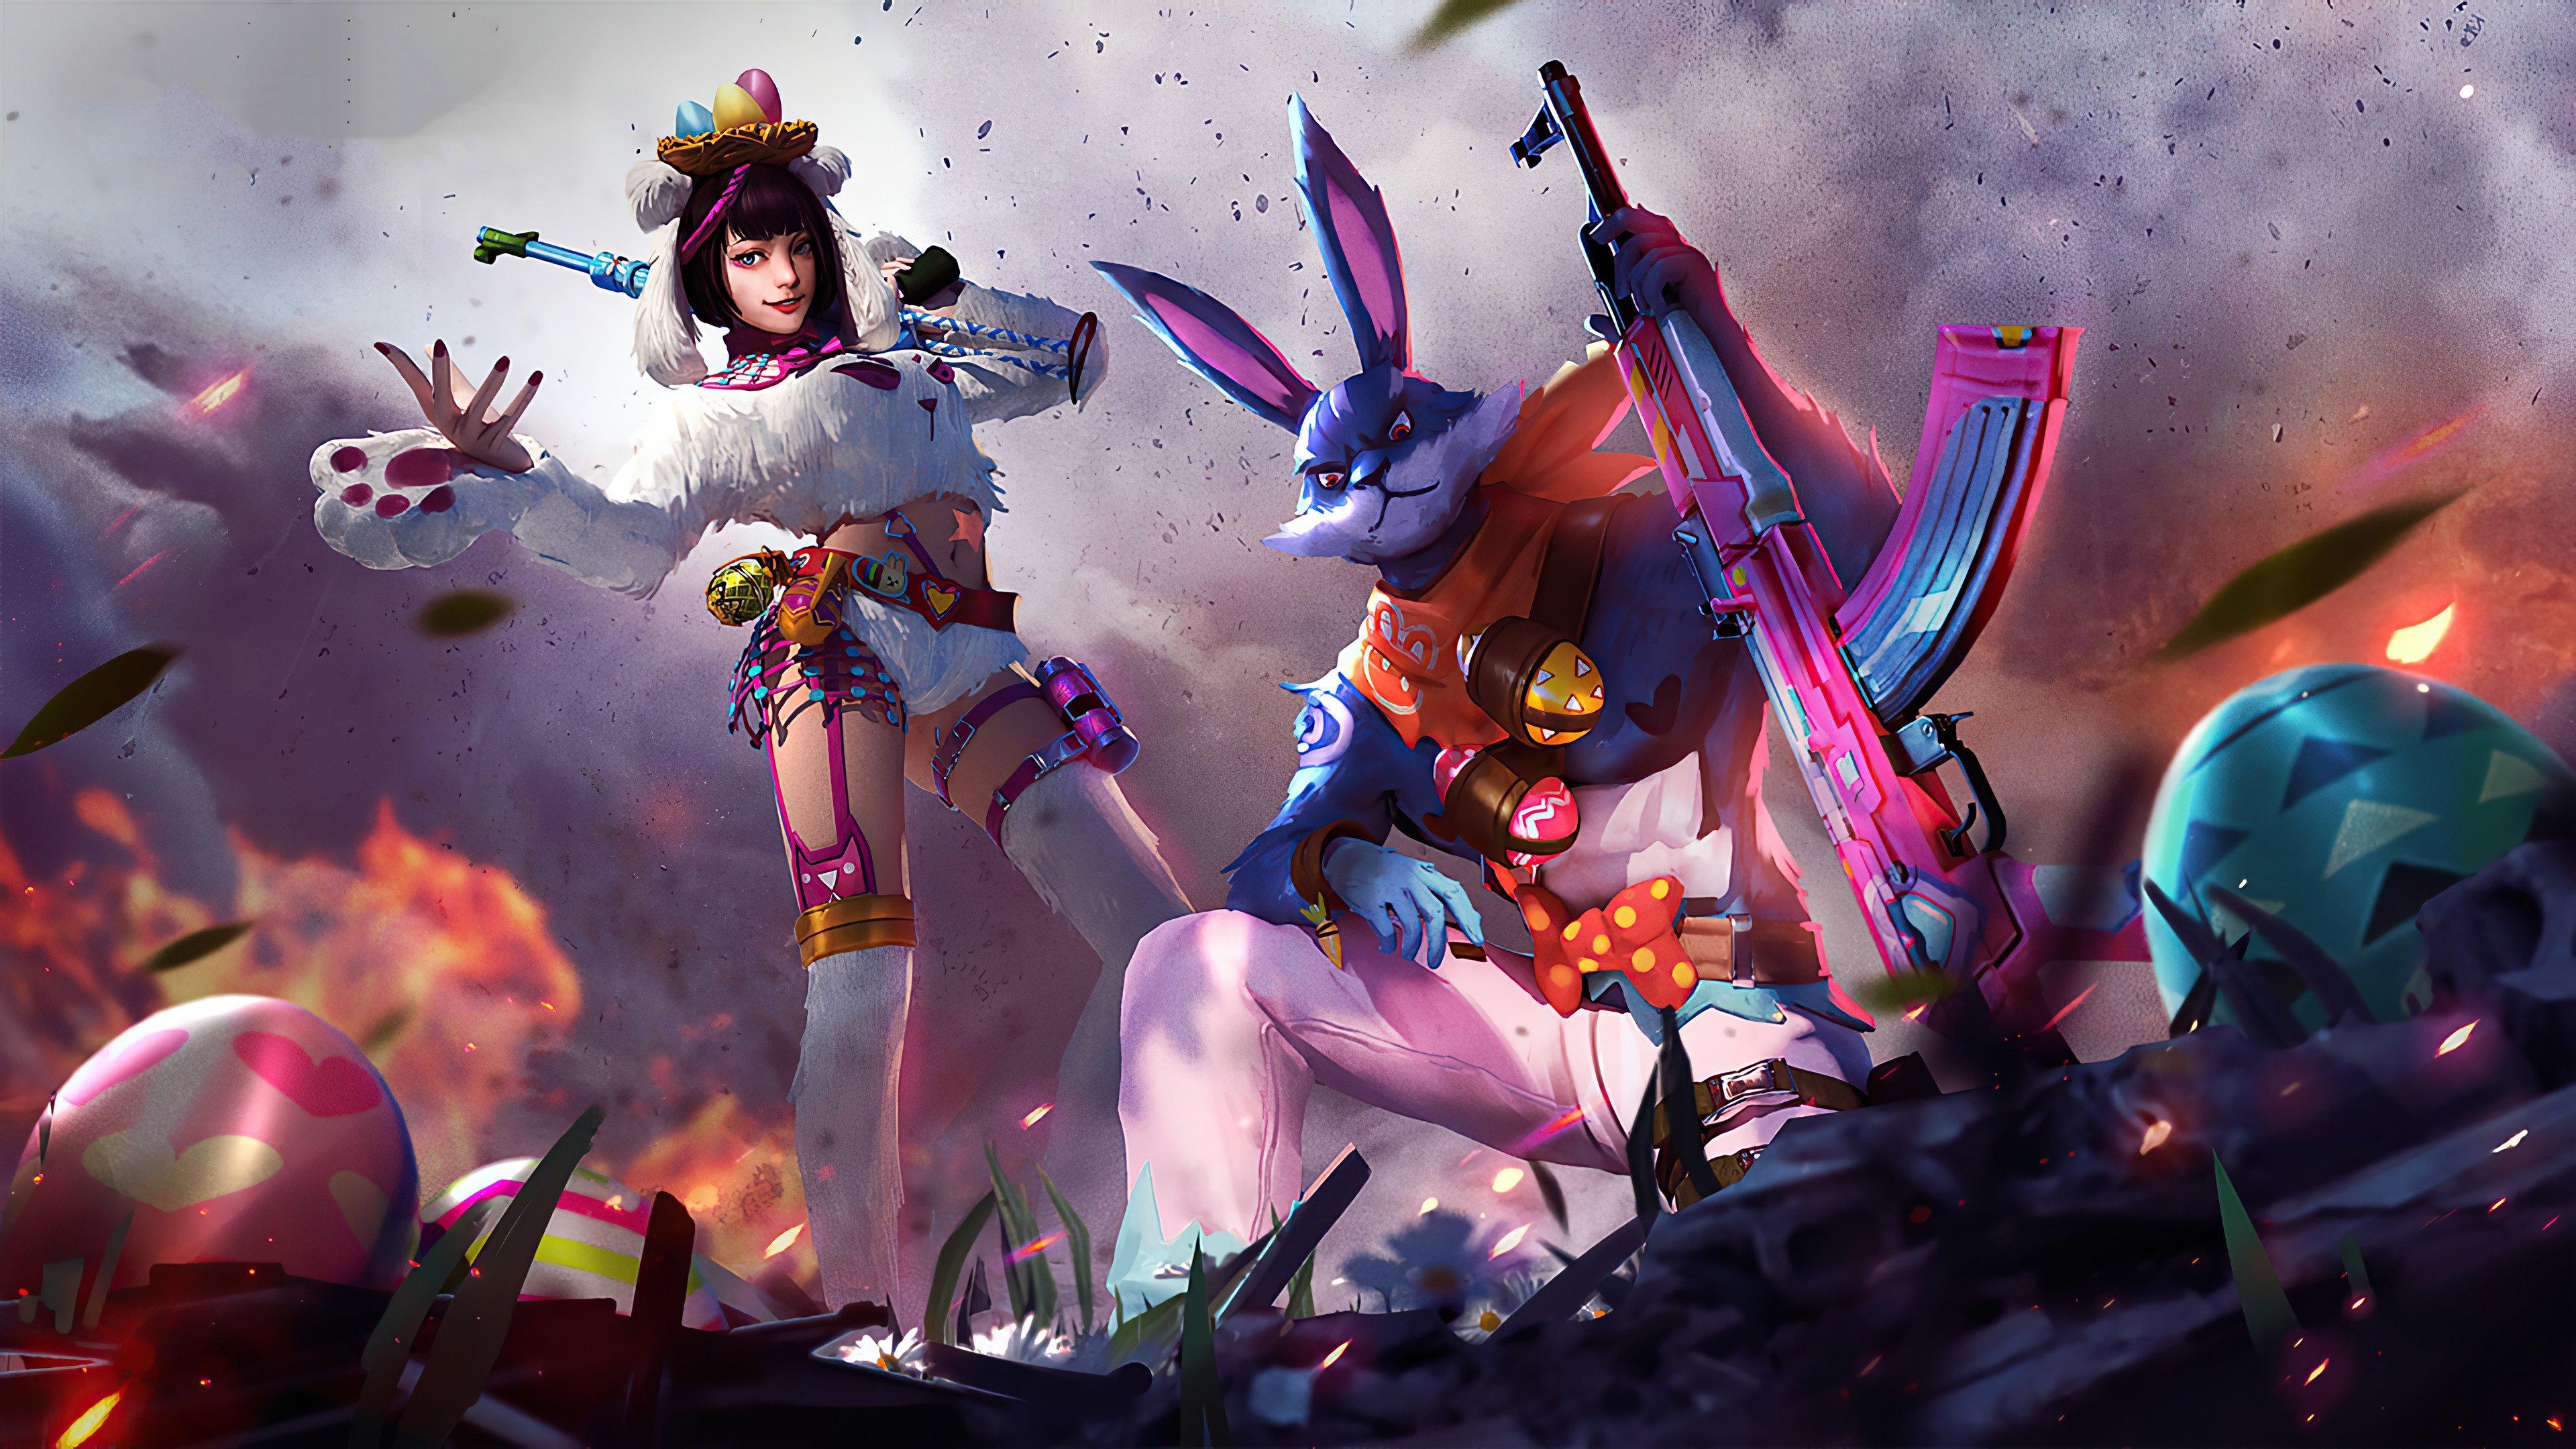 Wallpaper Garena Free Fire Bunny Warrior